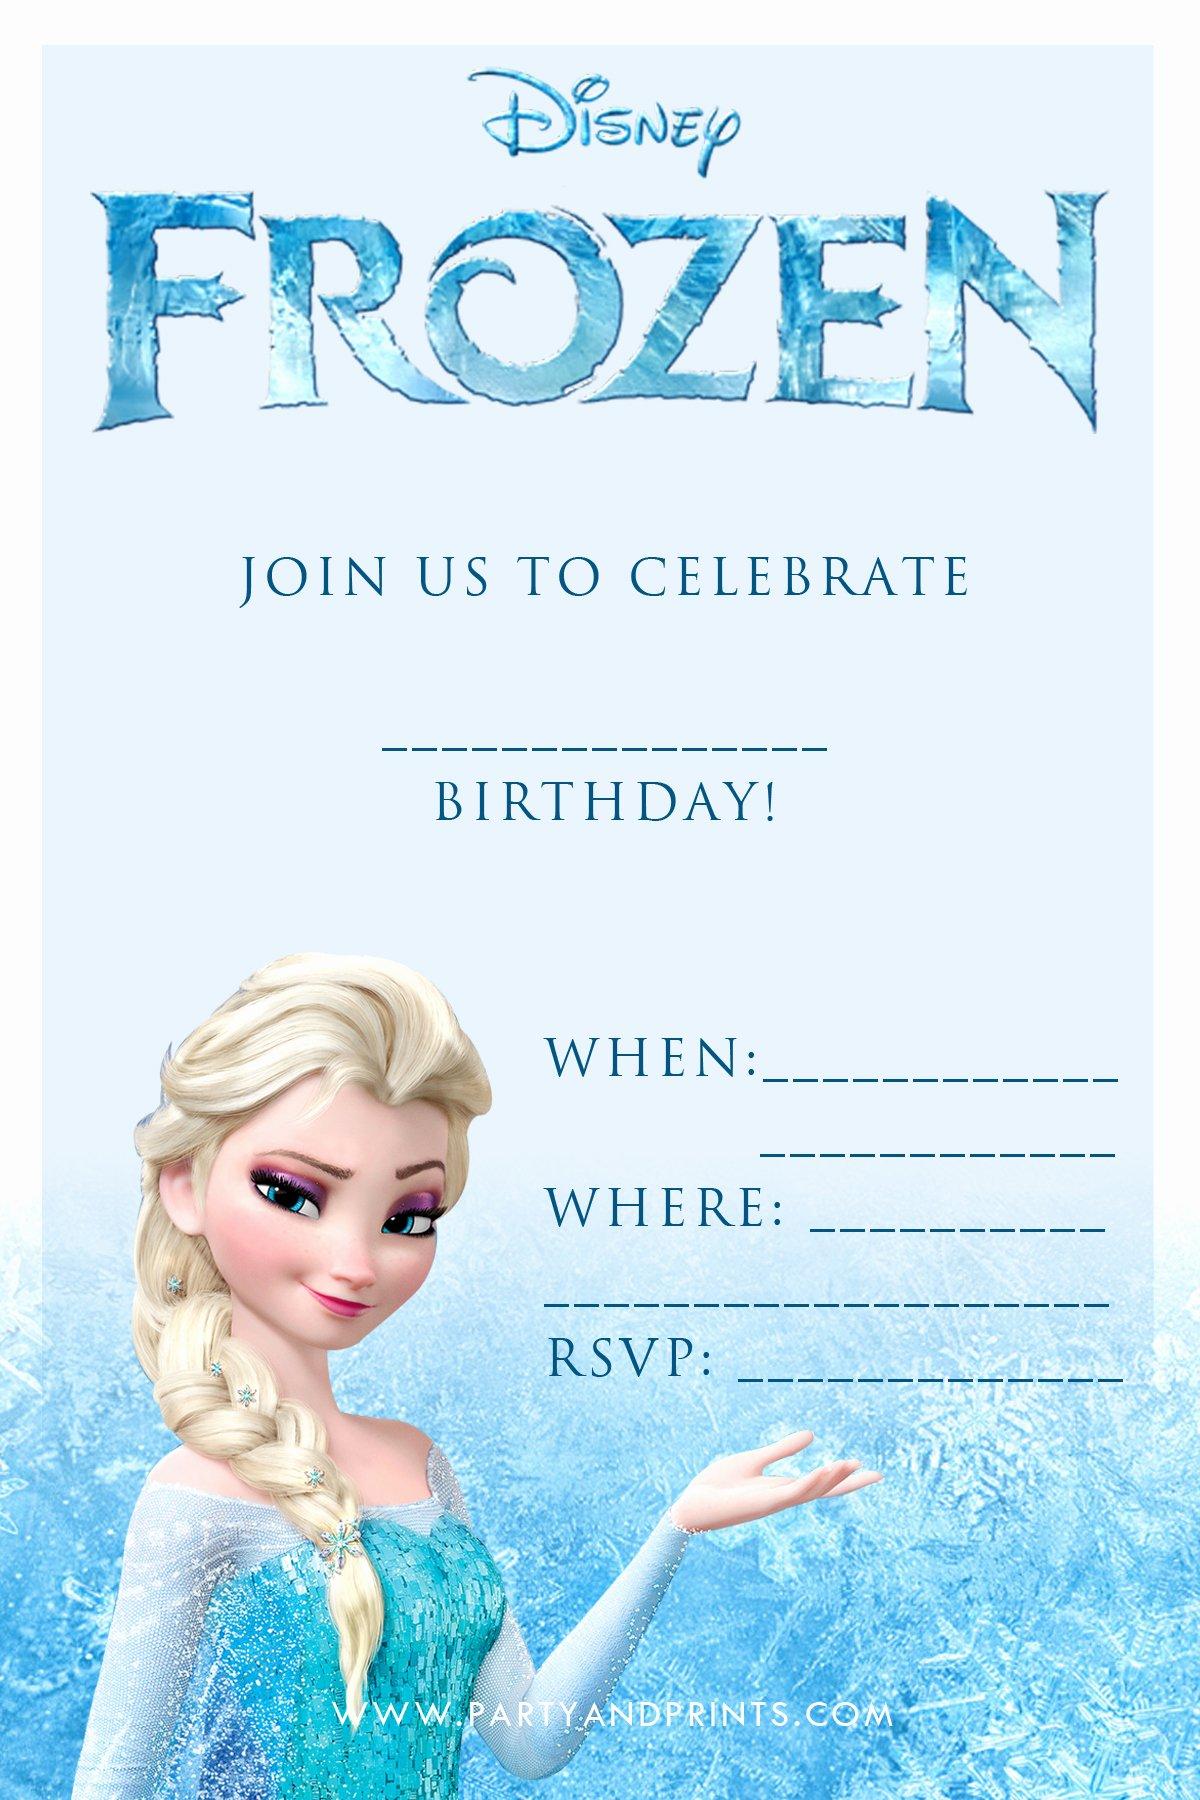 Free Frozen Invitations Templates Lovely 20 Frozen Birthday Party Ideas